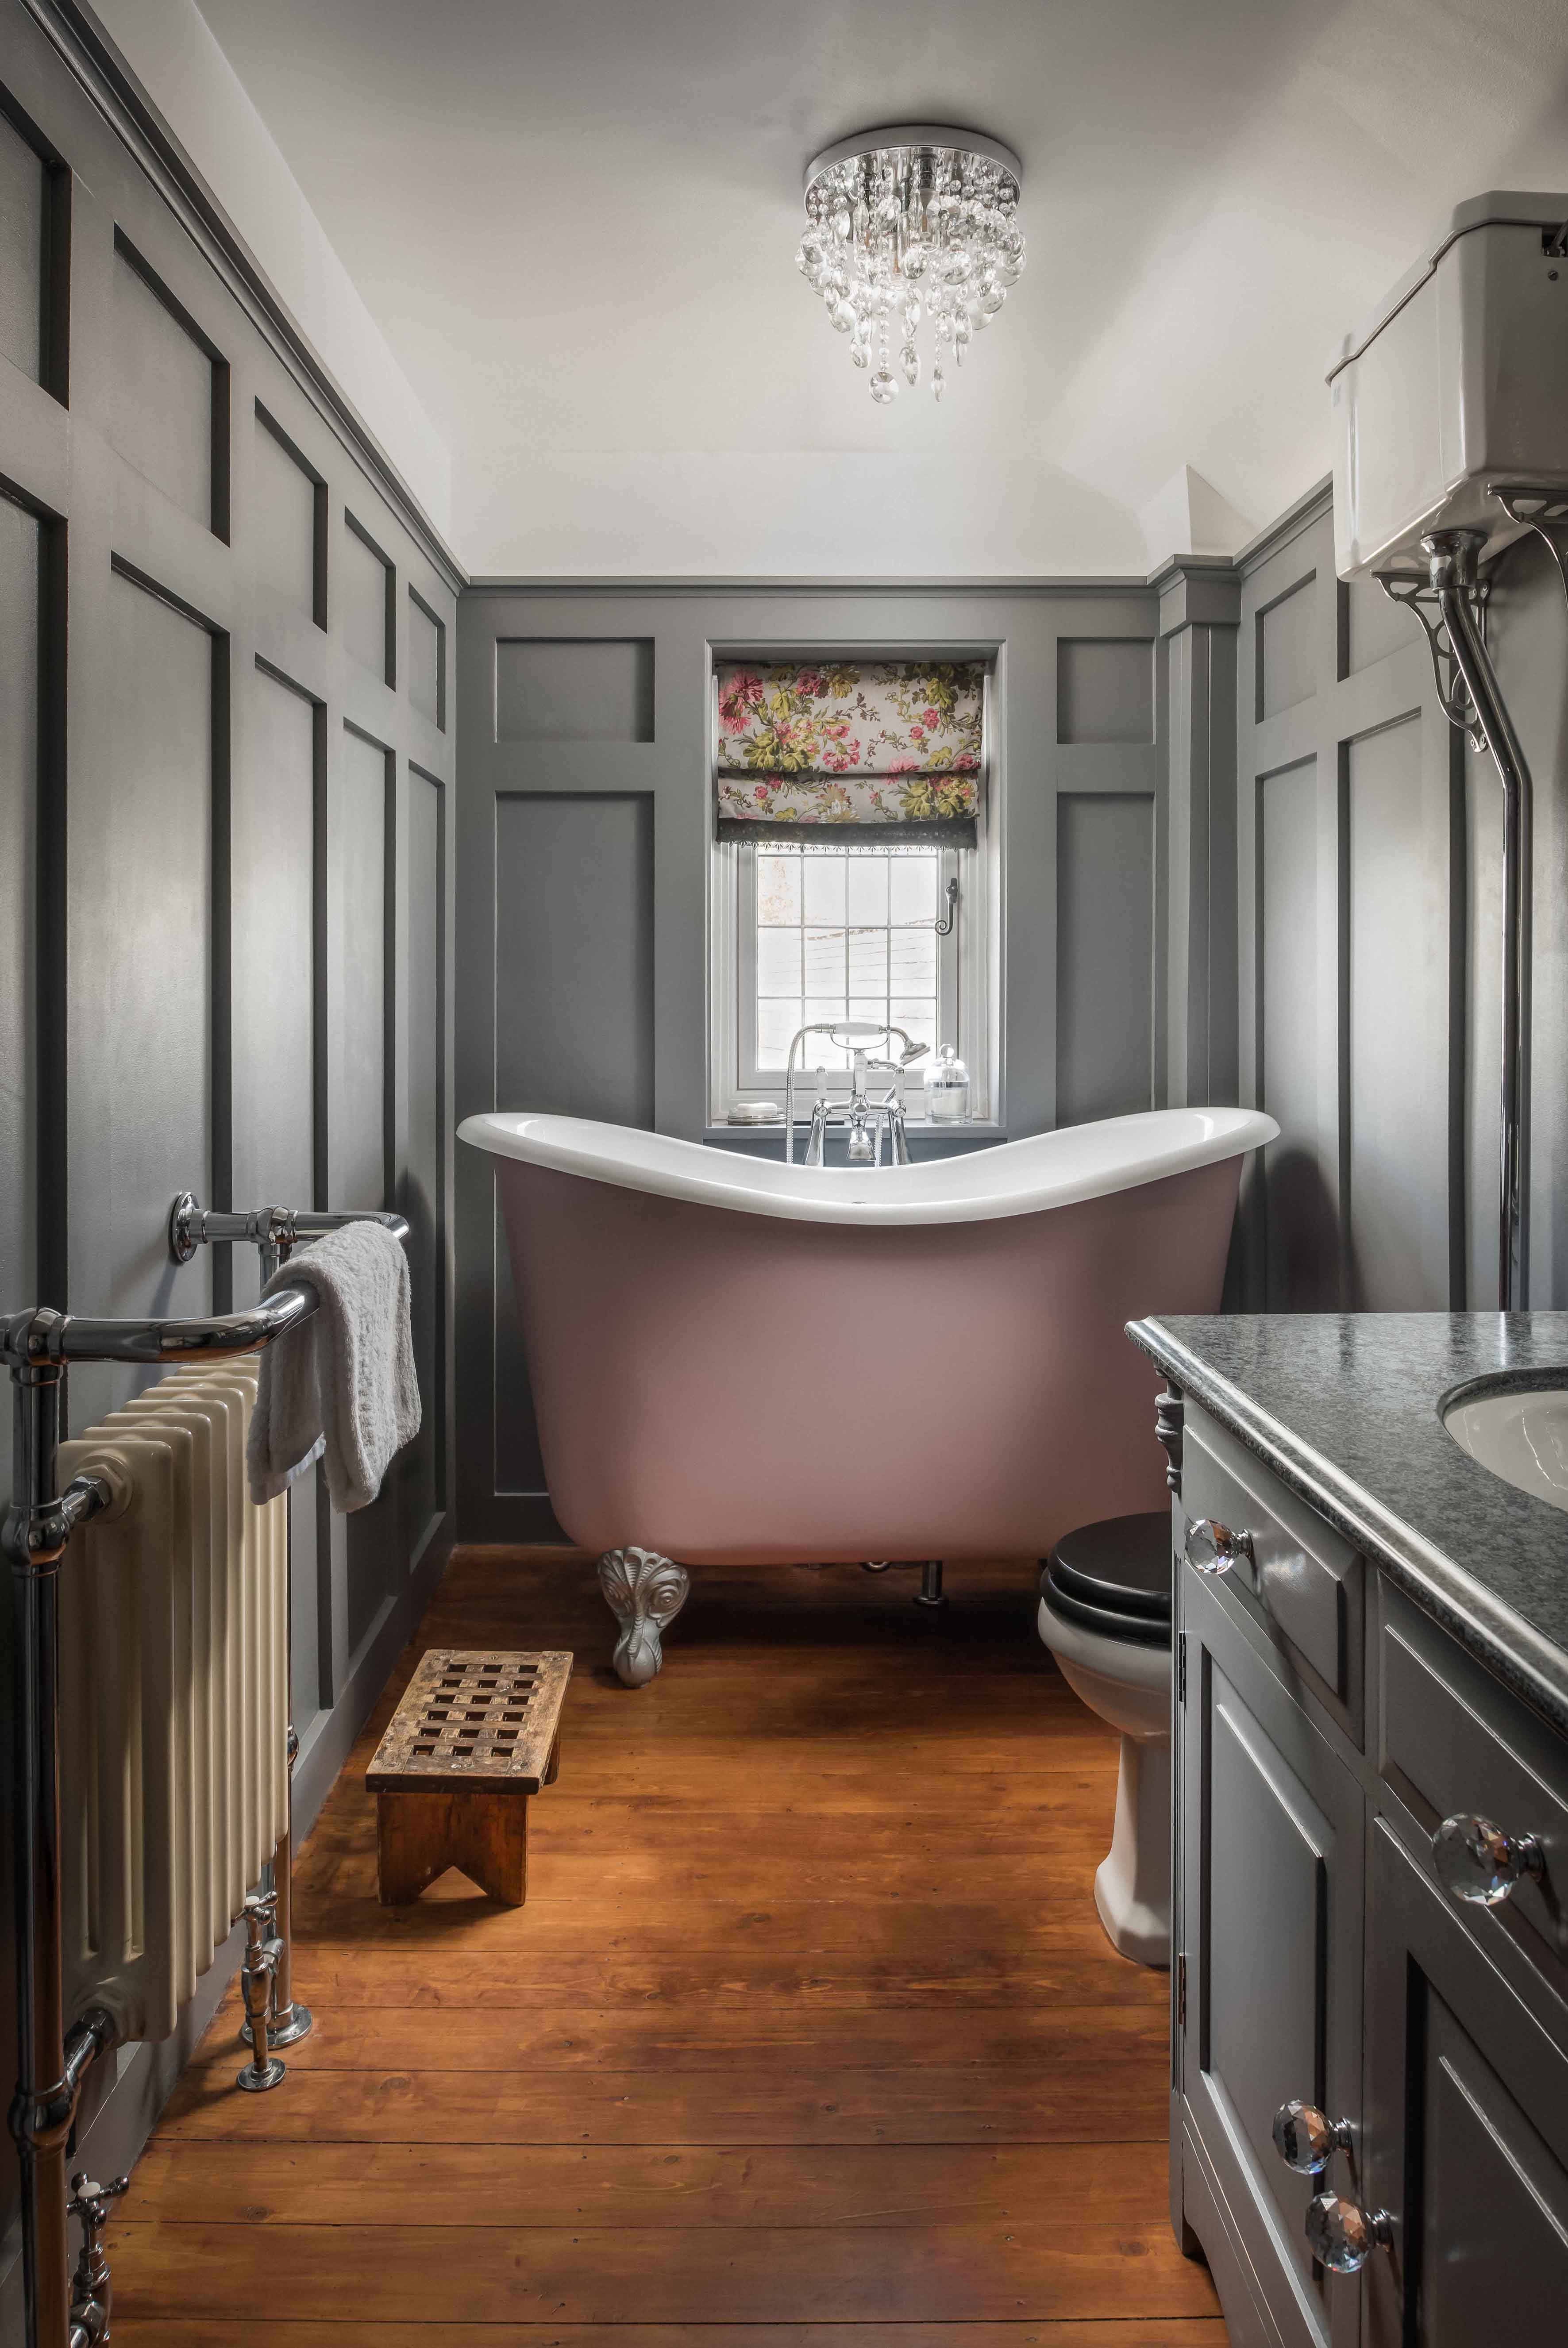 5 country bathroom ideas to transform your washroom - The ... on Rural Bathroom  id=42596